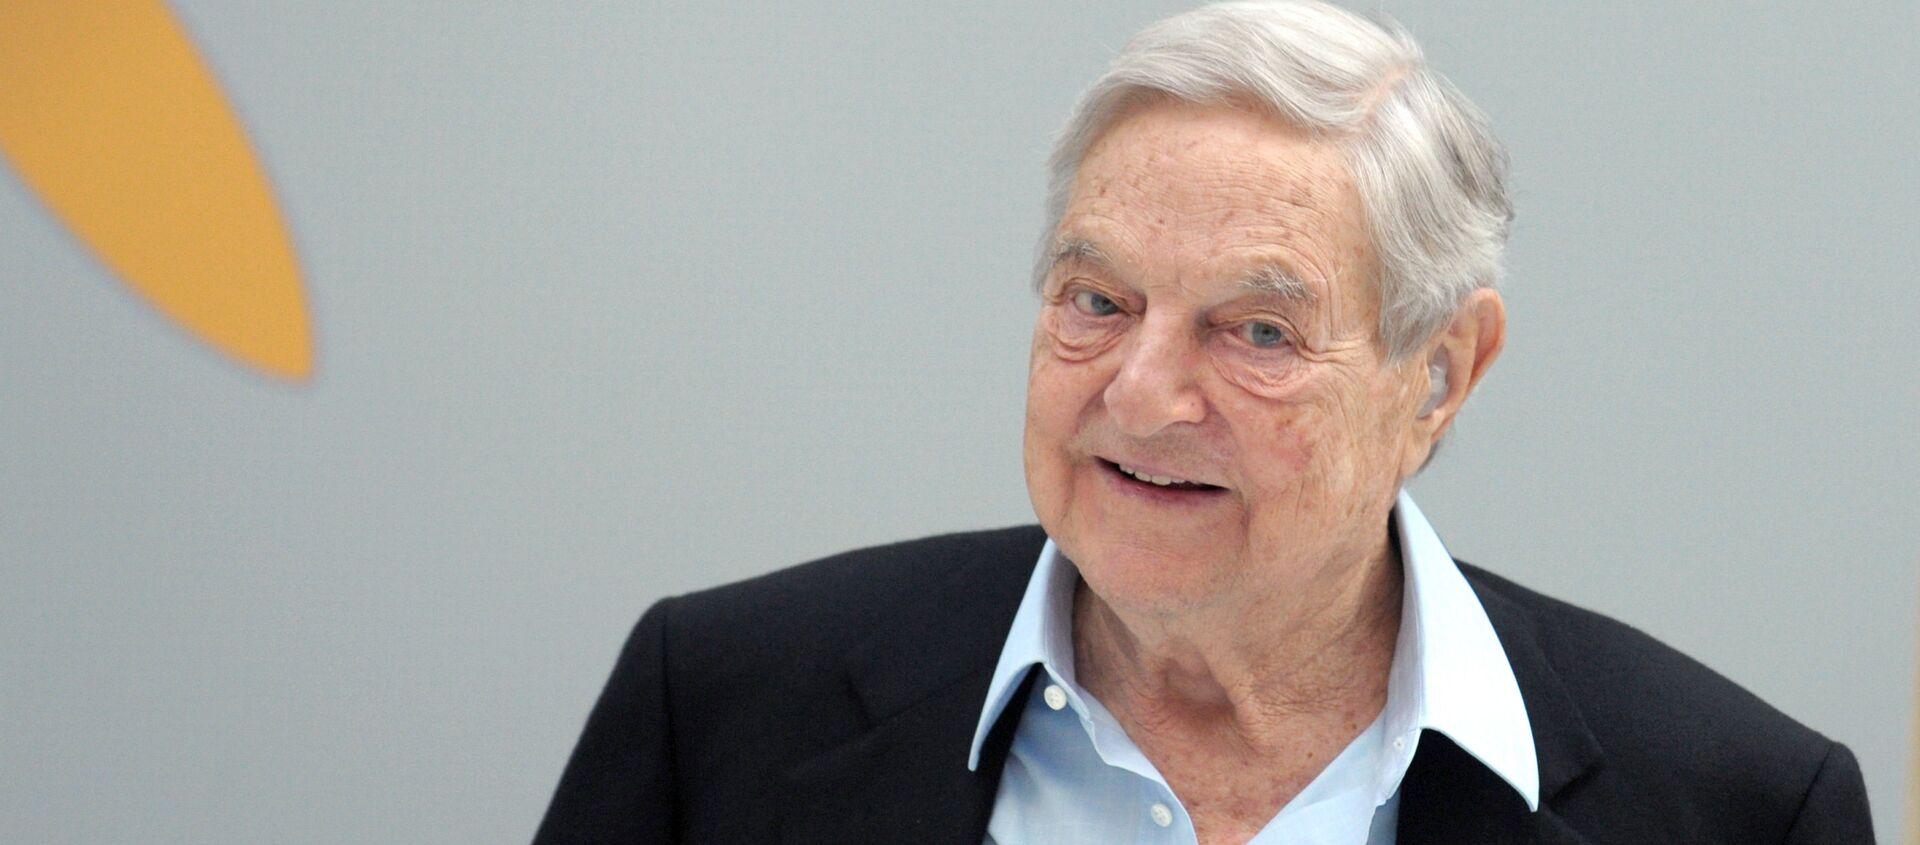 Hungarian-born US chairman of the Soros Fund Management, George Soros - Sputnik International, 1920, 23.07.2021